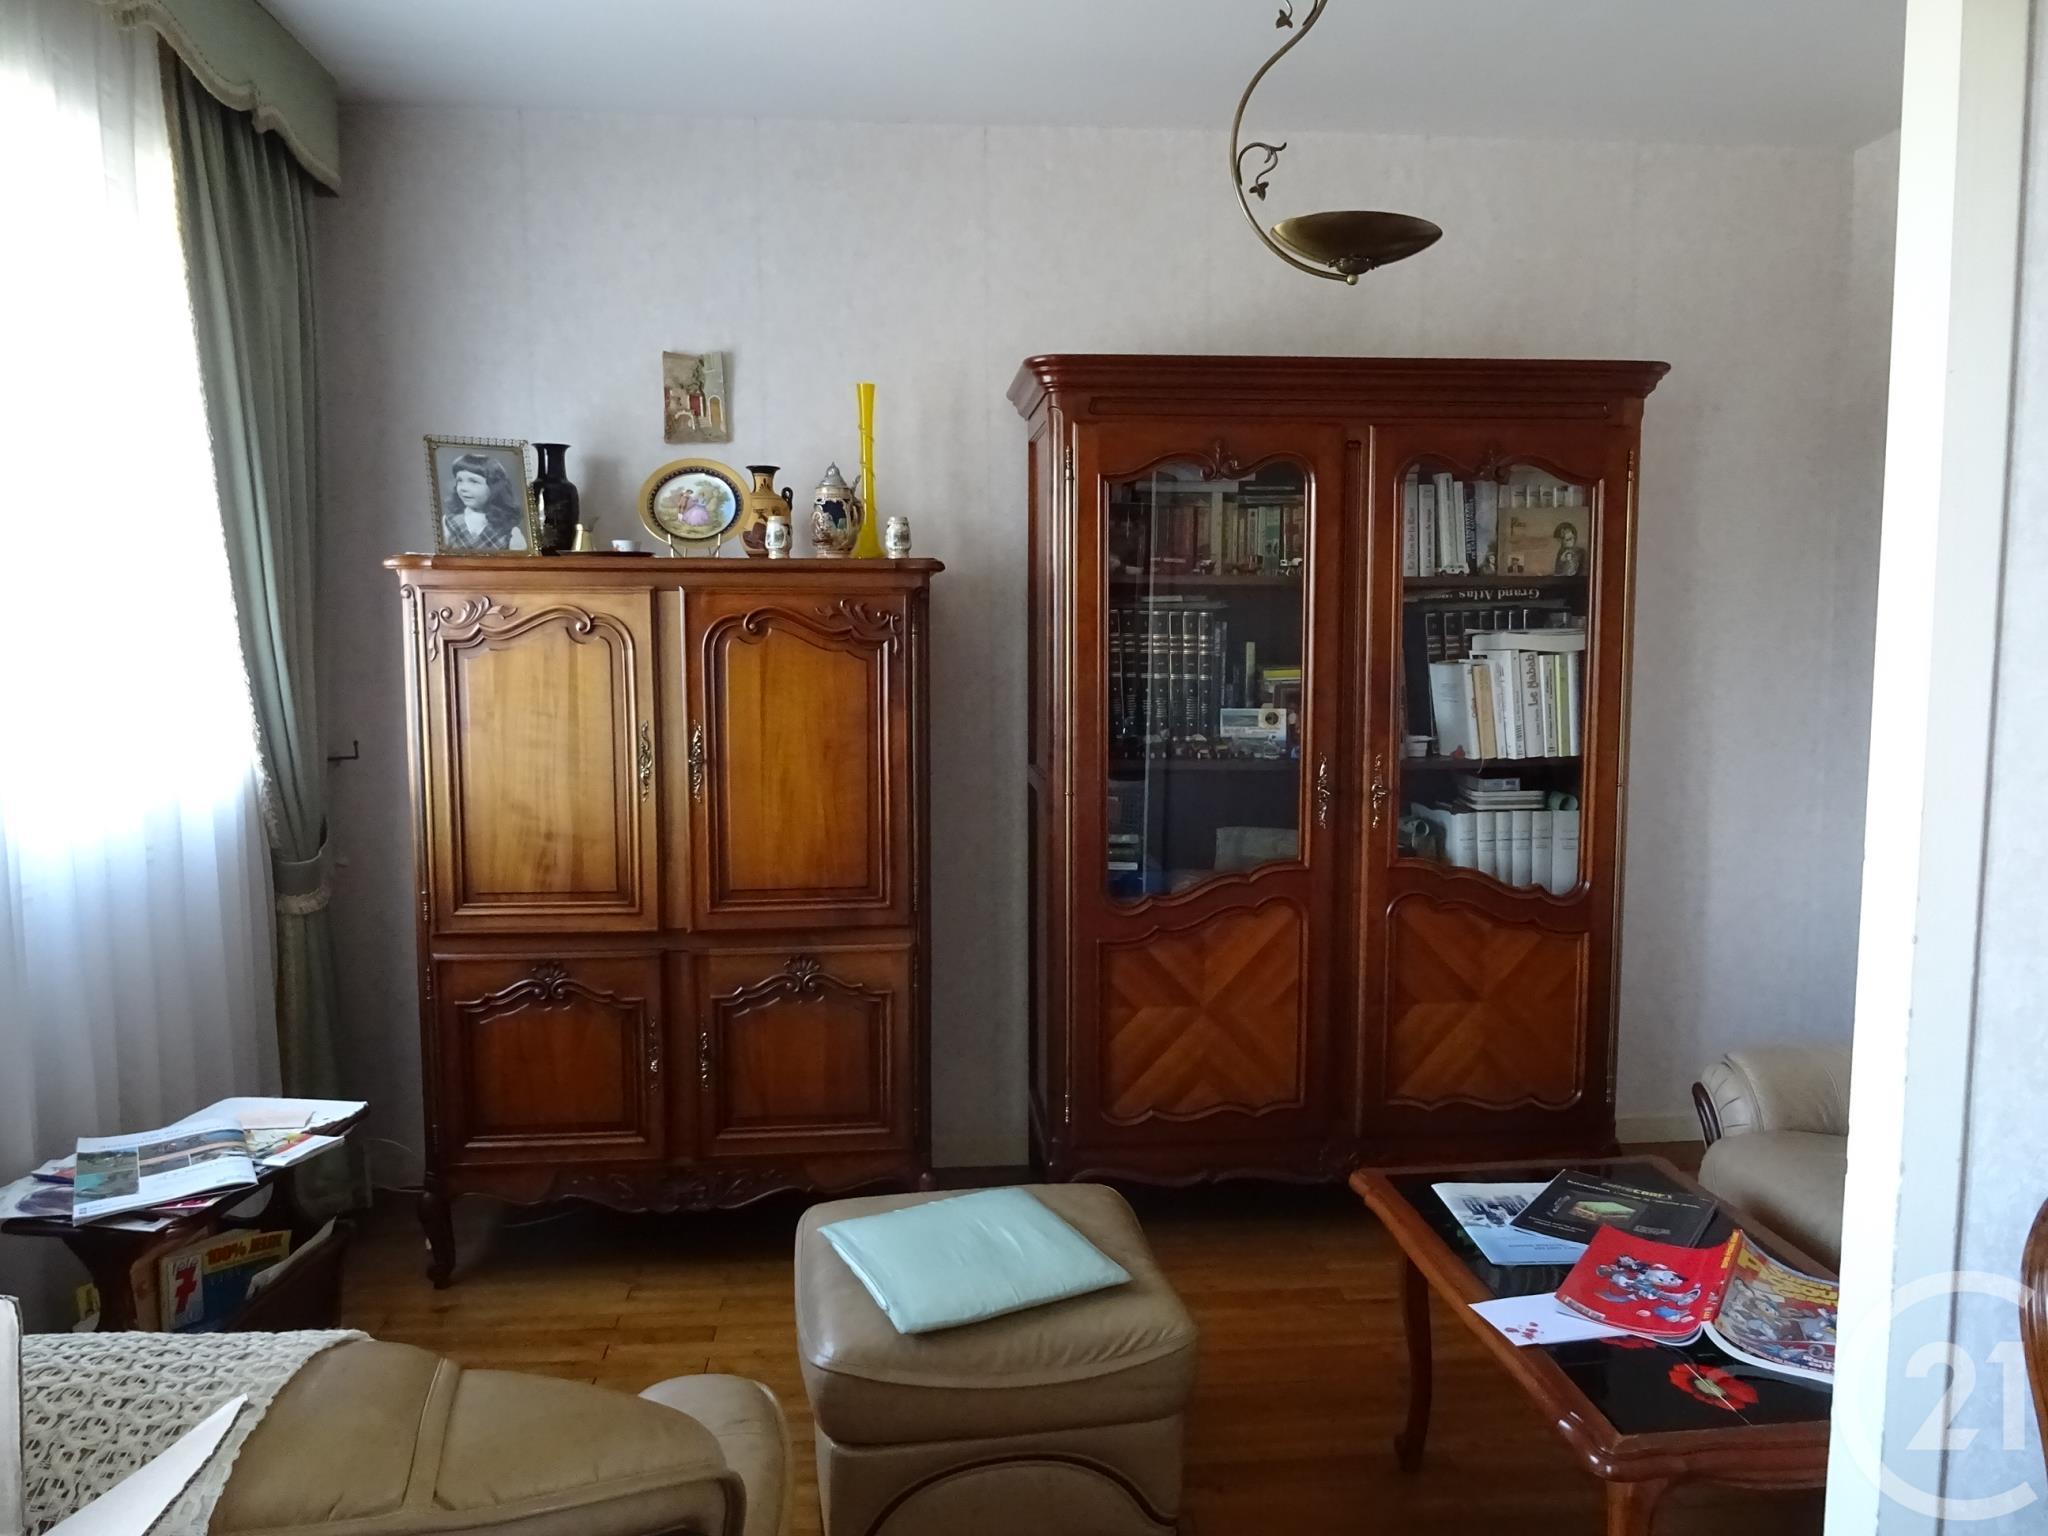 appartement f4 3 pi ces vendre nantes 44300 ref 53365 century 21. Black Bedroom Furniture Sets. Home Design Ideas